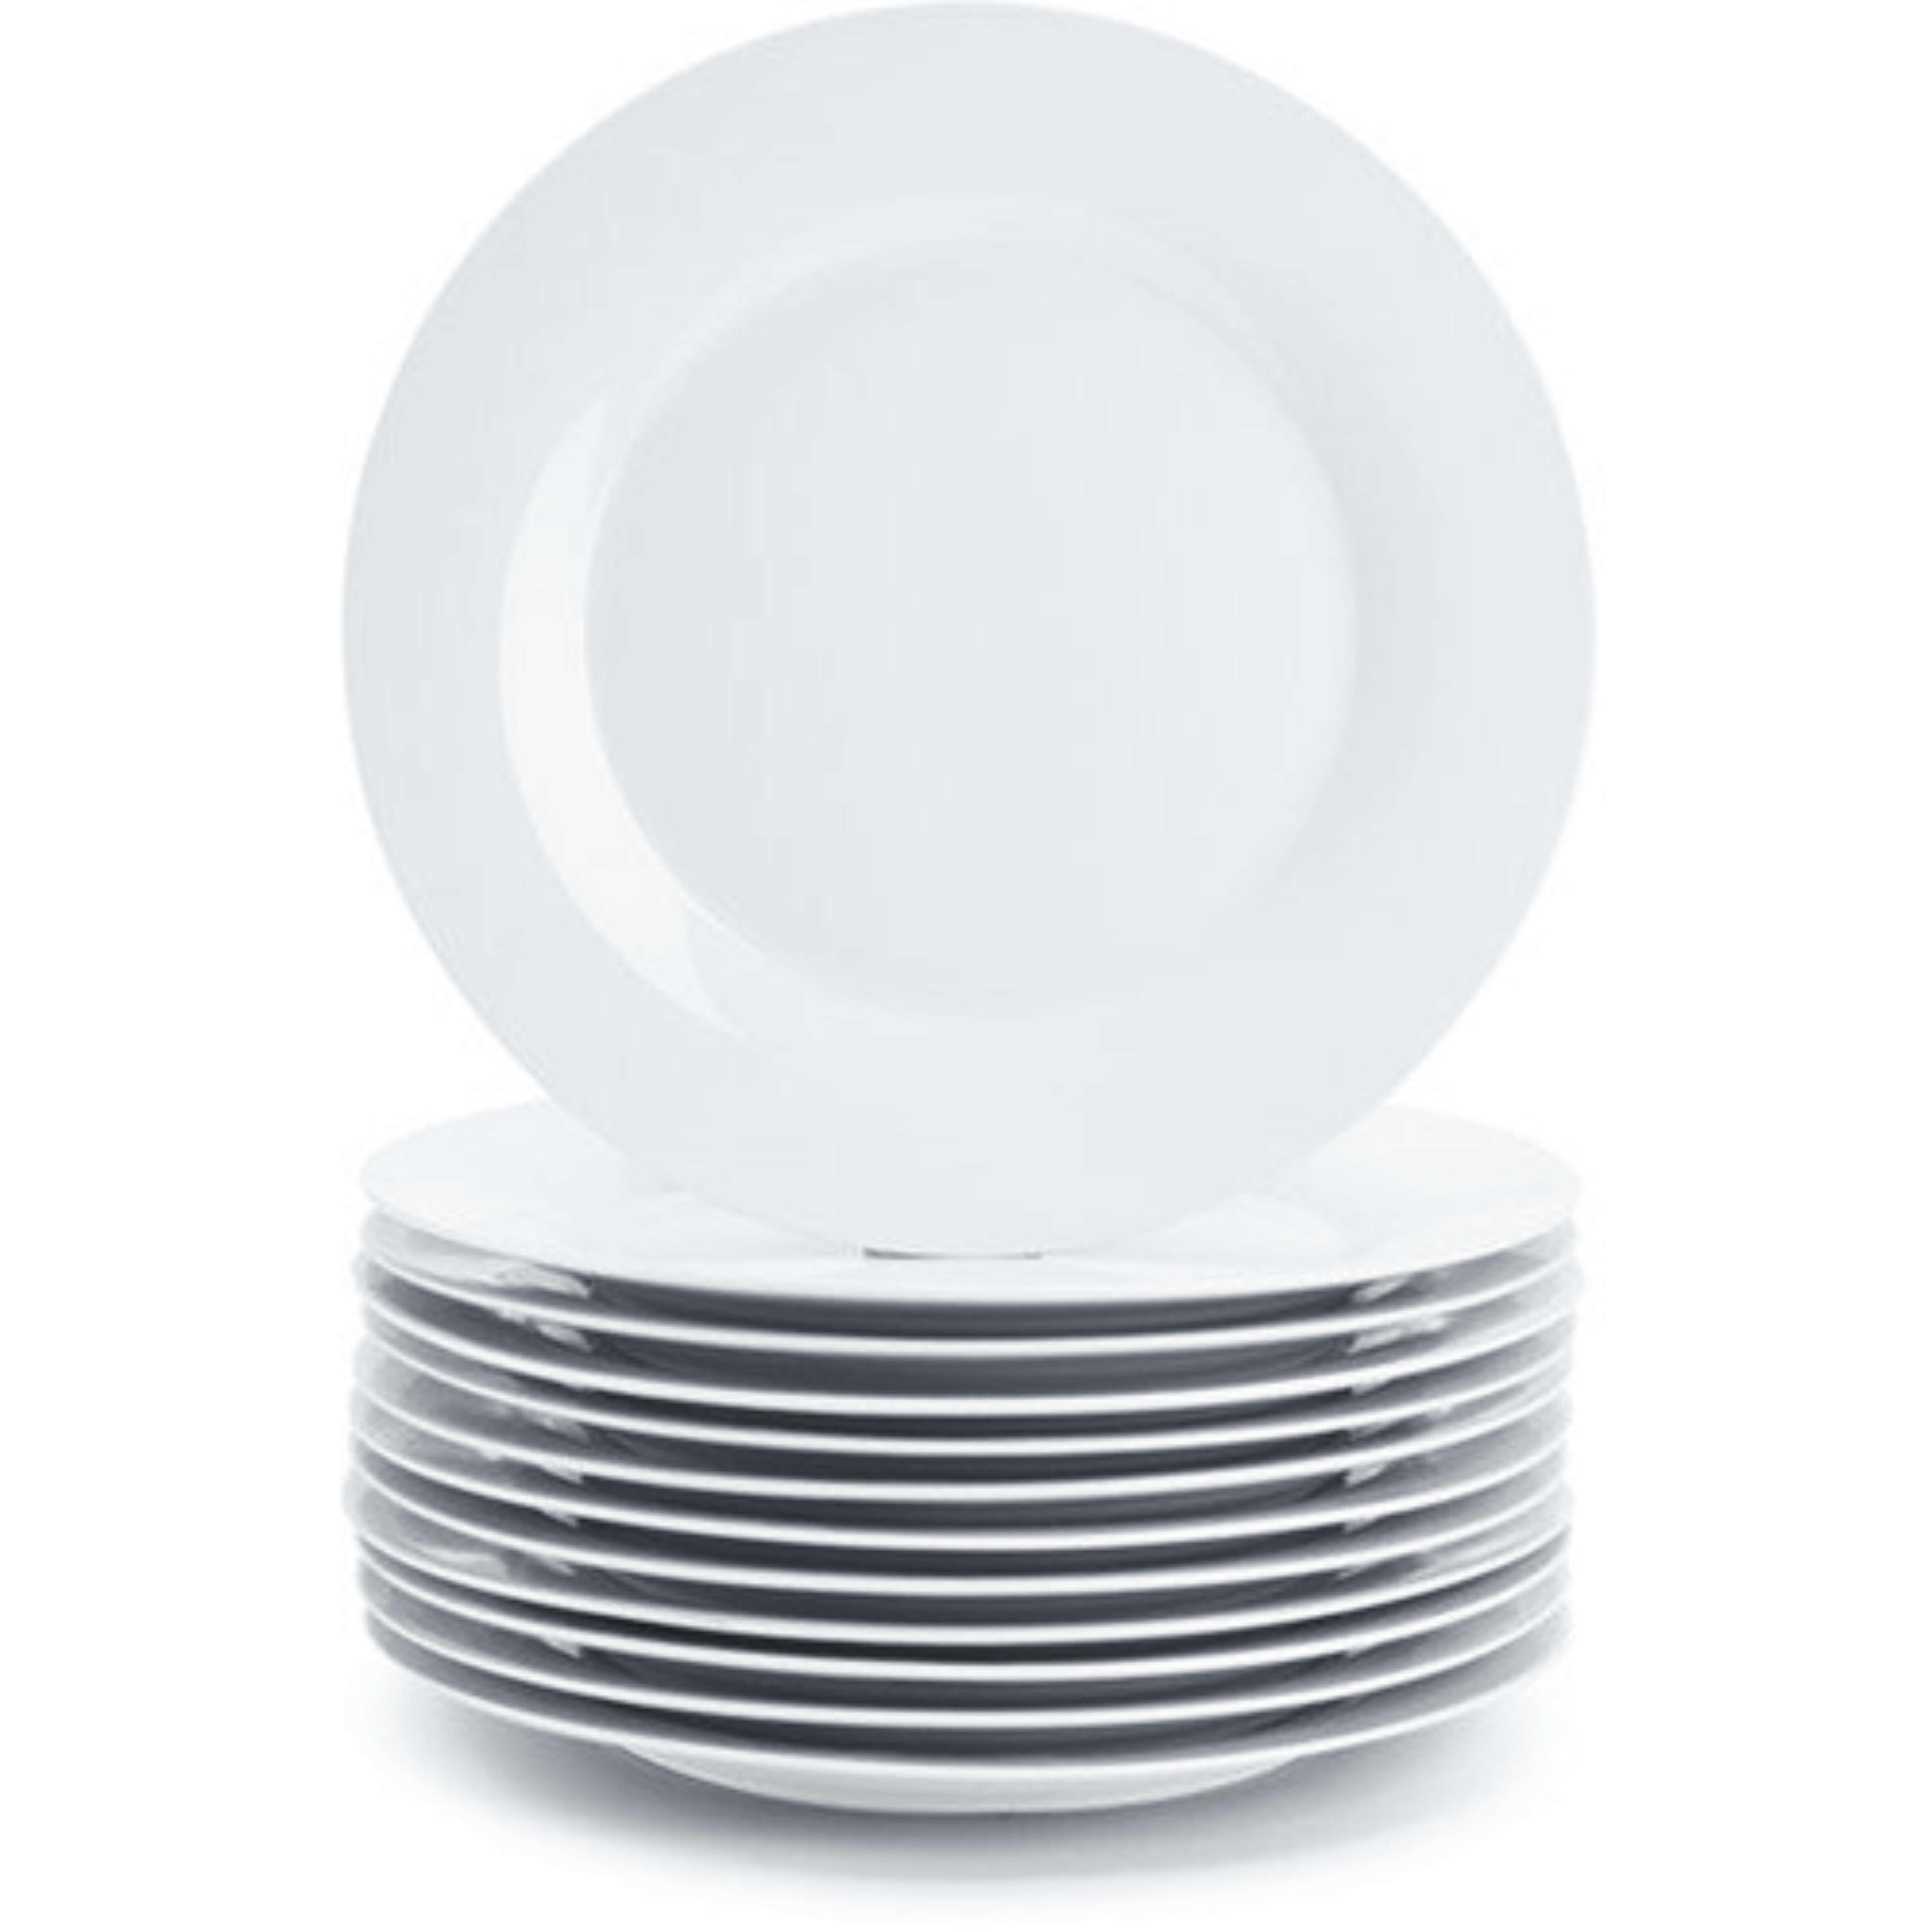 Plates For Sale >> Crockery Dinner Plates Dinner Plates For Sale Sa